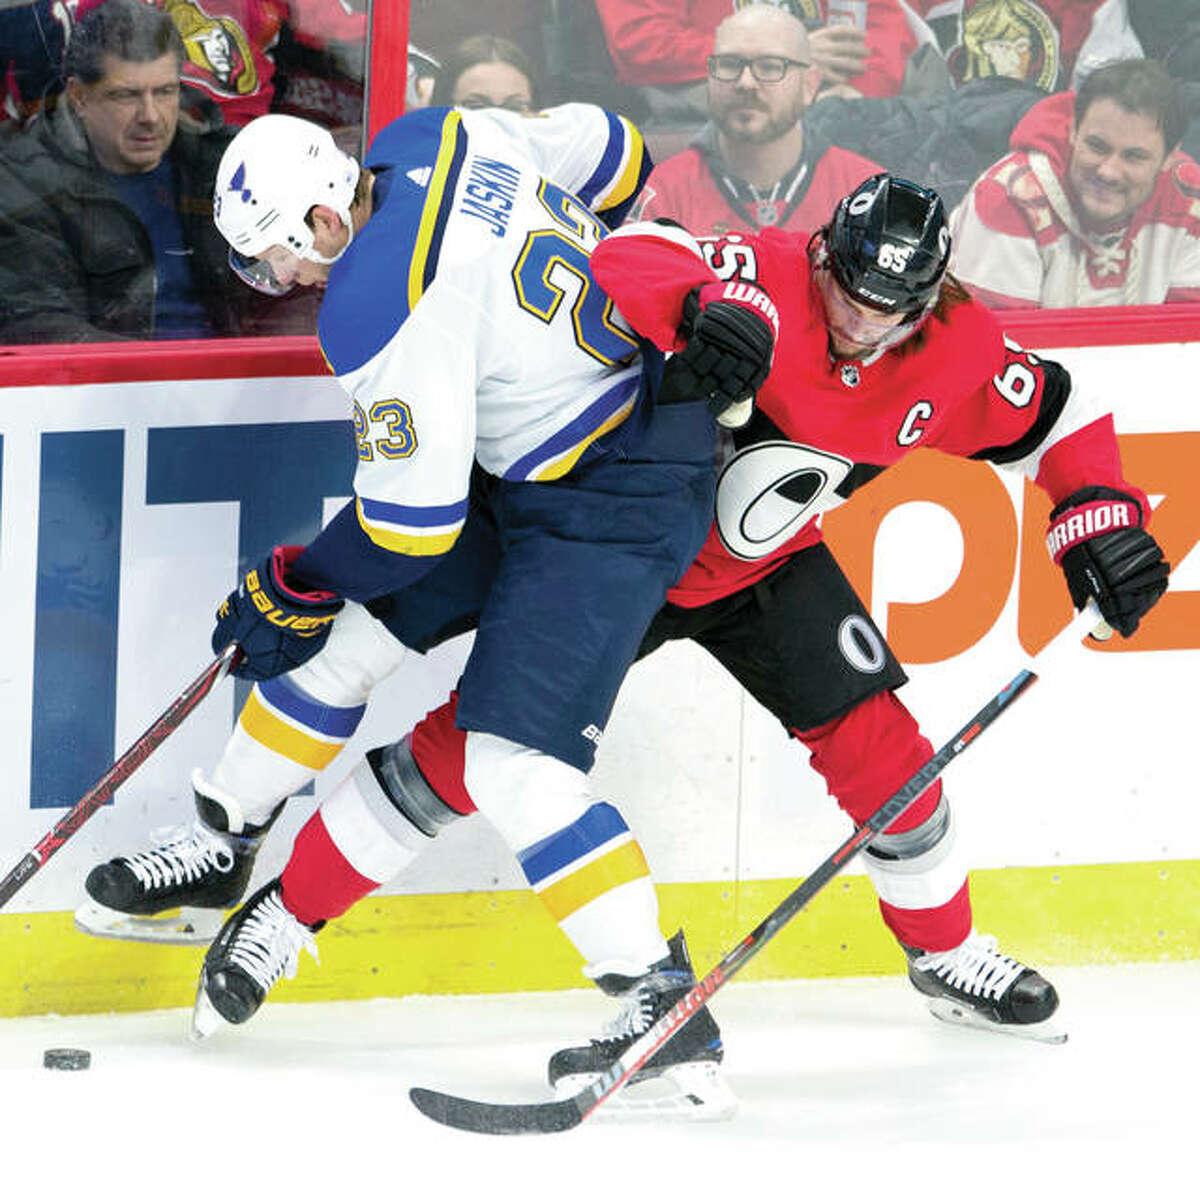 Ottawa defenseman Erik Karlsson (65) battles with the Blues' Dmitrij Jaskin along the boards during Thursday night's game in Ottawa, Ontario.